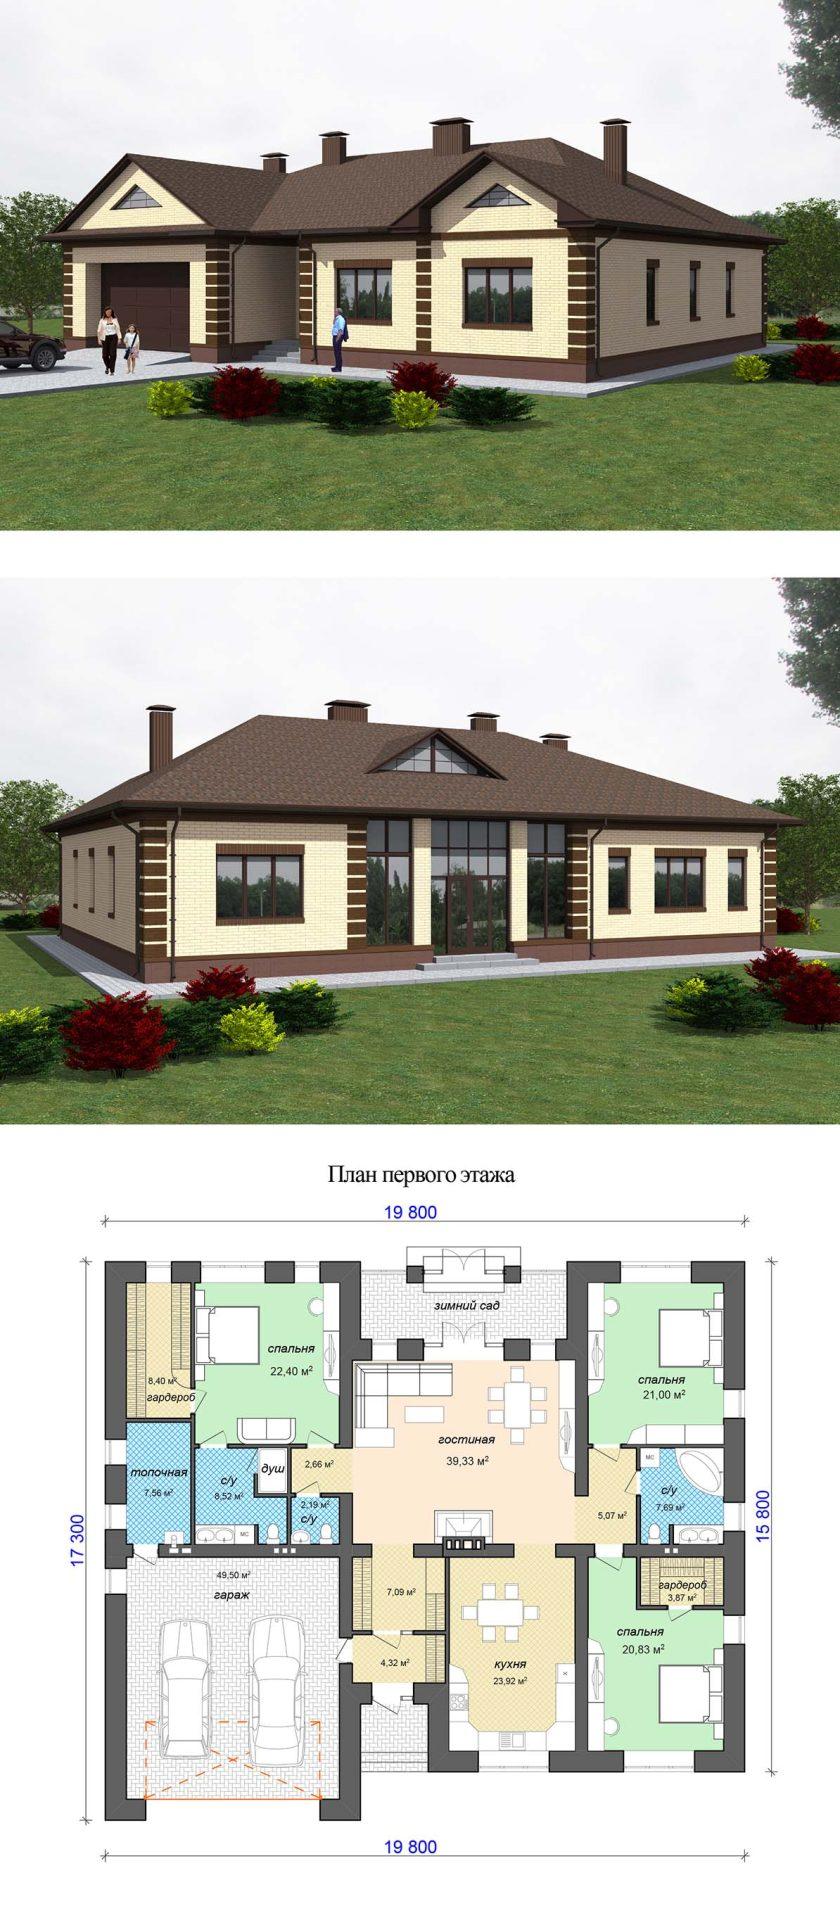 Проект дома 4 комнаты один этаж